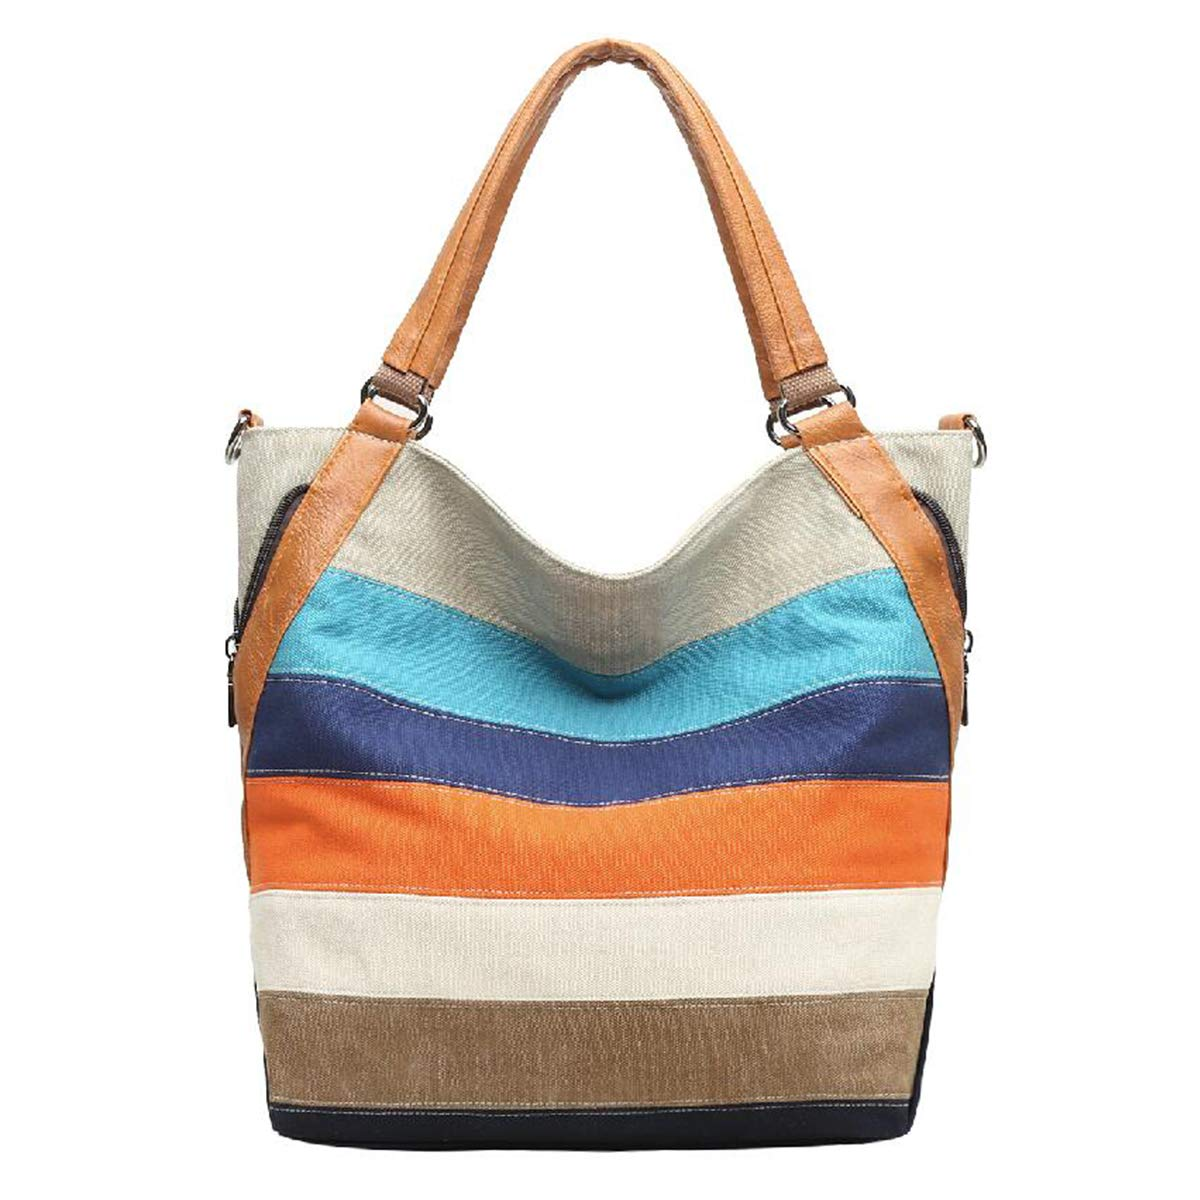 8fb9563cb5 Eshow Women s Canvas Shoulder Bag Crossbody Bag Purse Top Handle Handbag  Tote Daily Hobo Casual Shopping